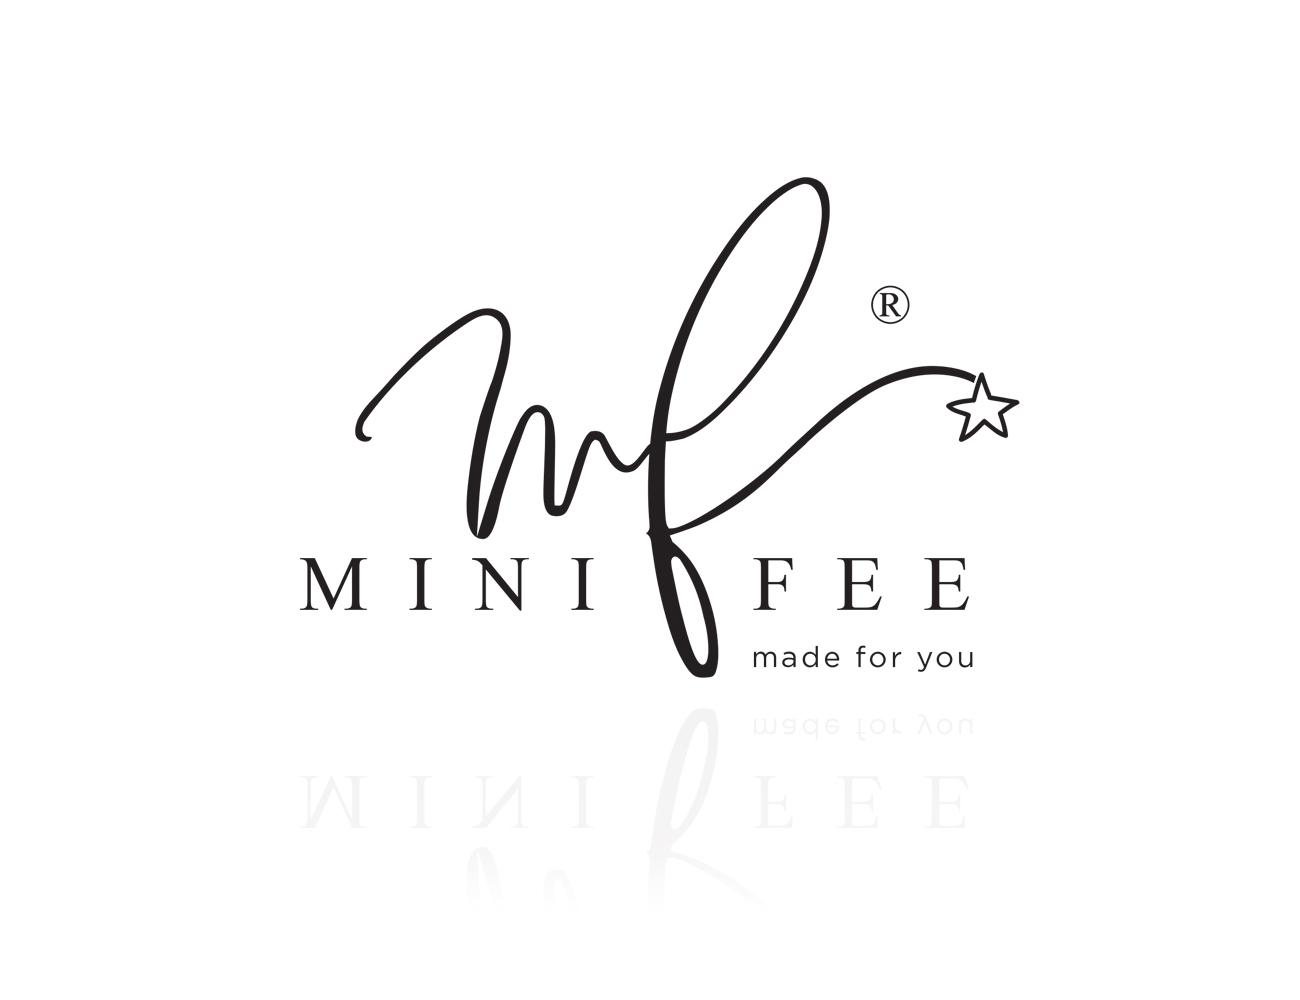 minifeelogodesign1